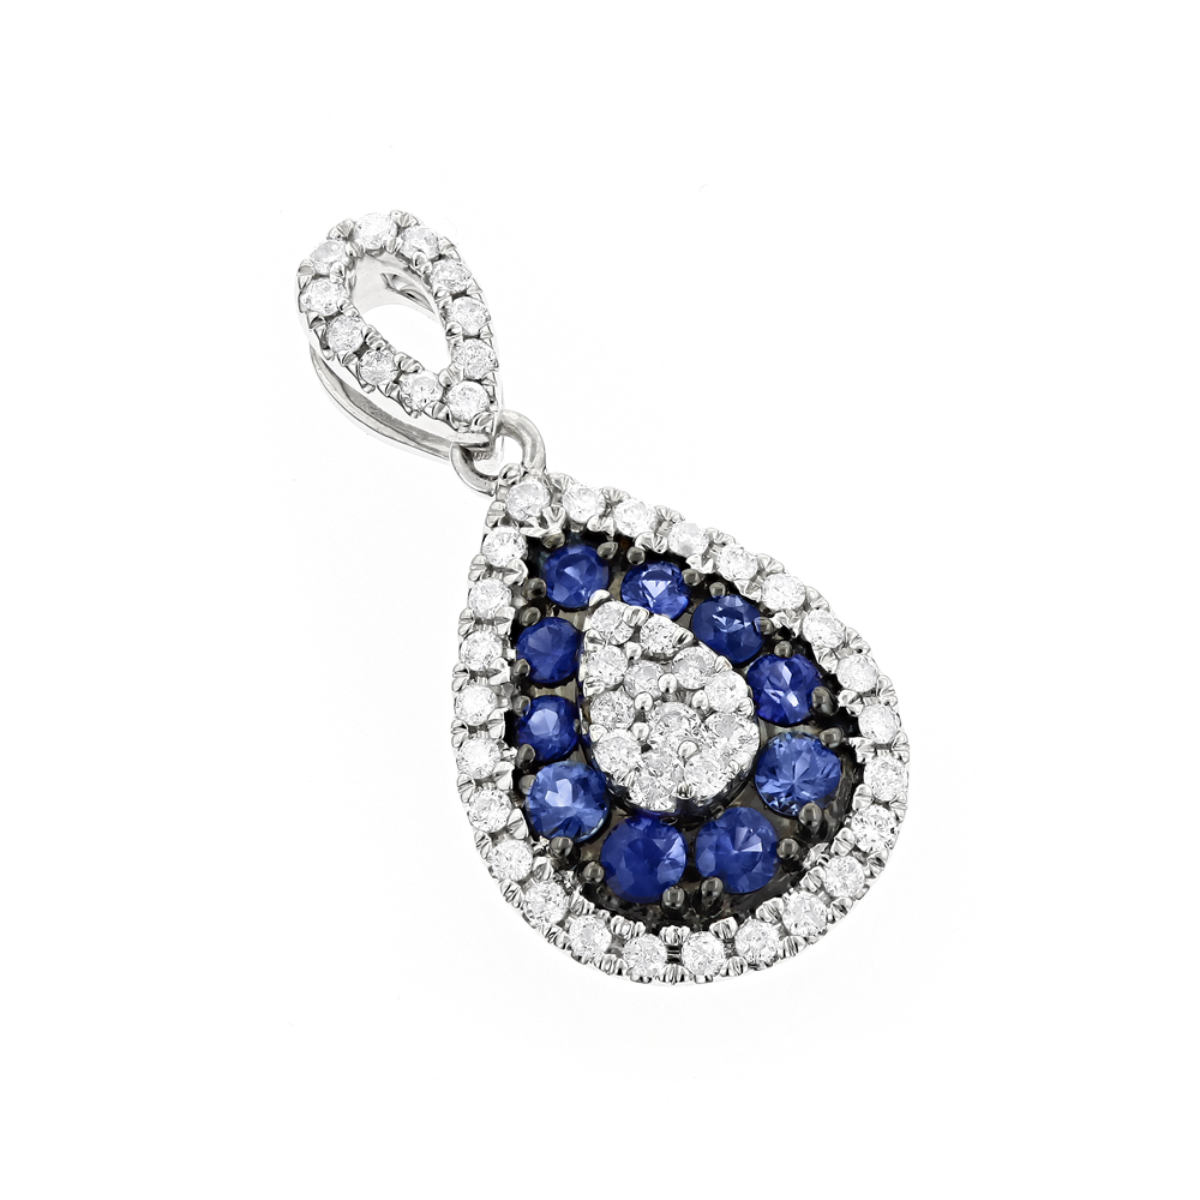 14K Gold Pear Shape Blue Sapphire and Diamond Drop Pendant for Women 1tcw